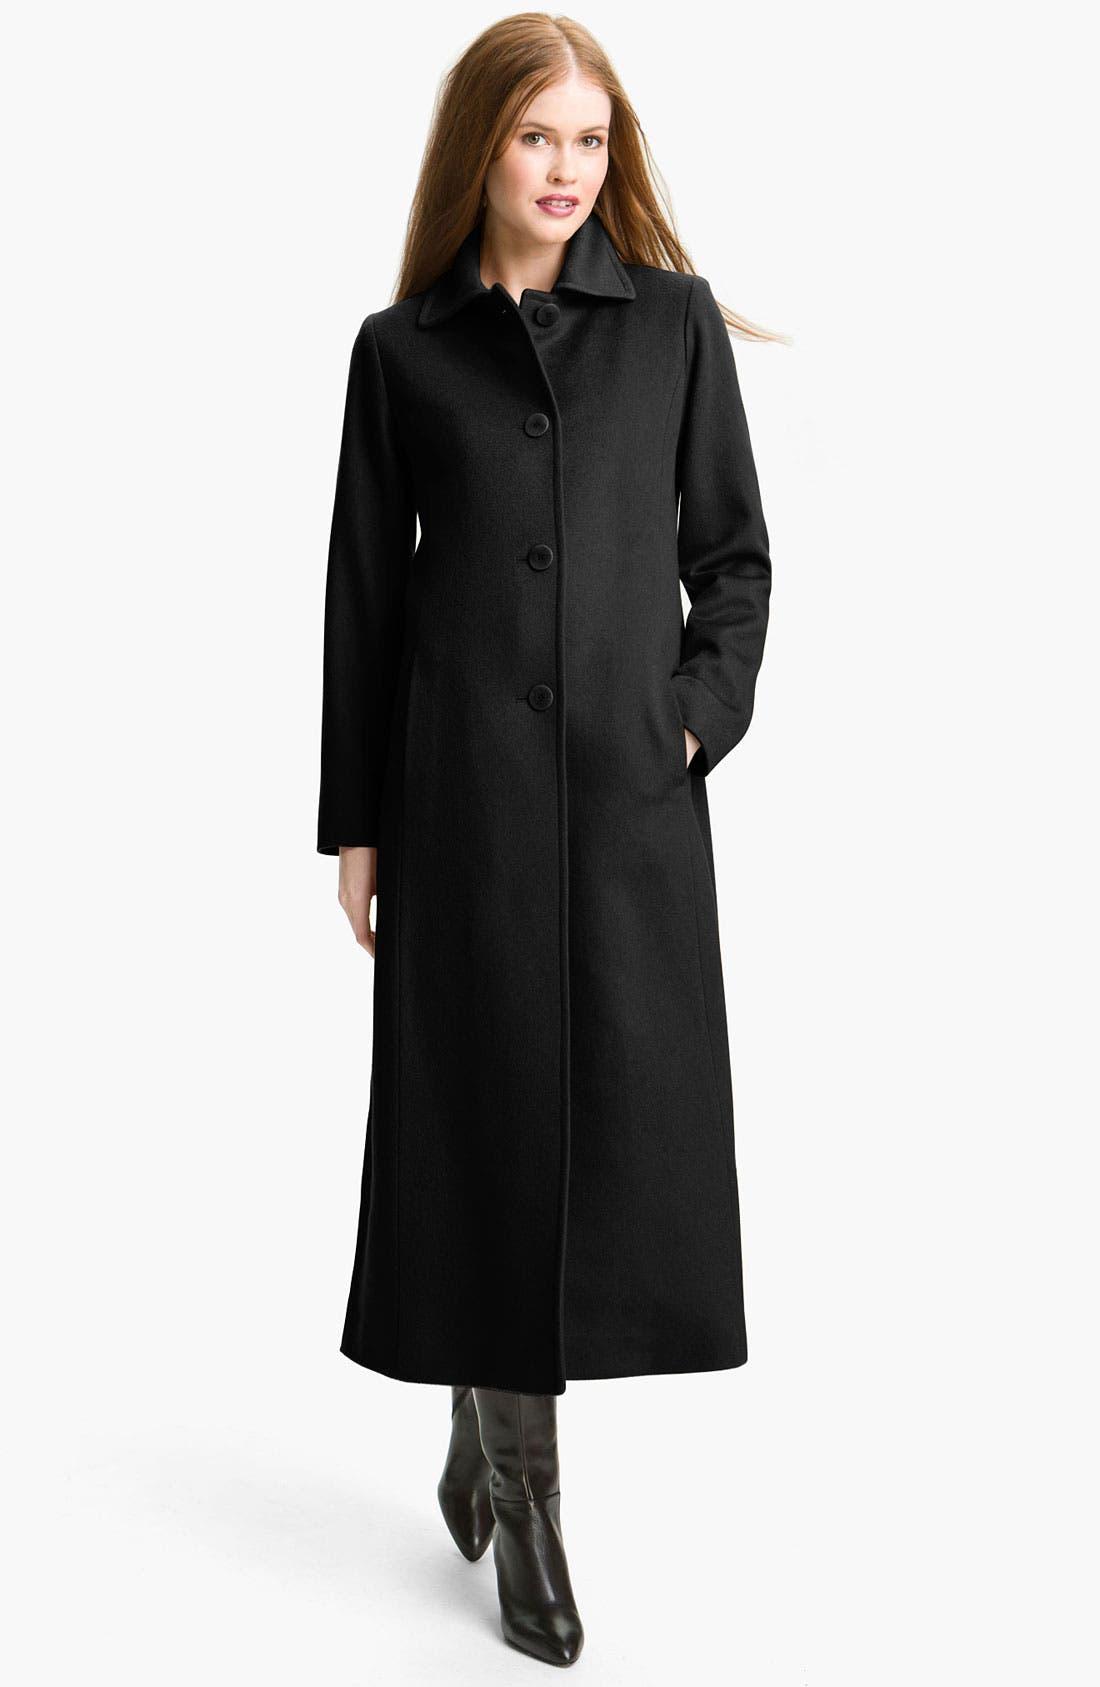 Main Image - Fleurette Single Breasted Cashmere Coat